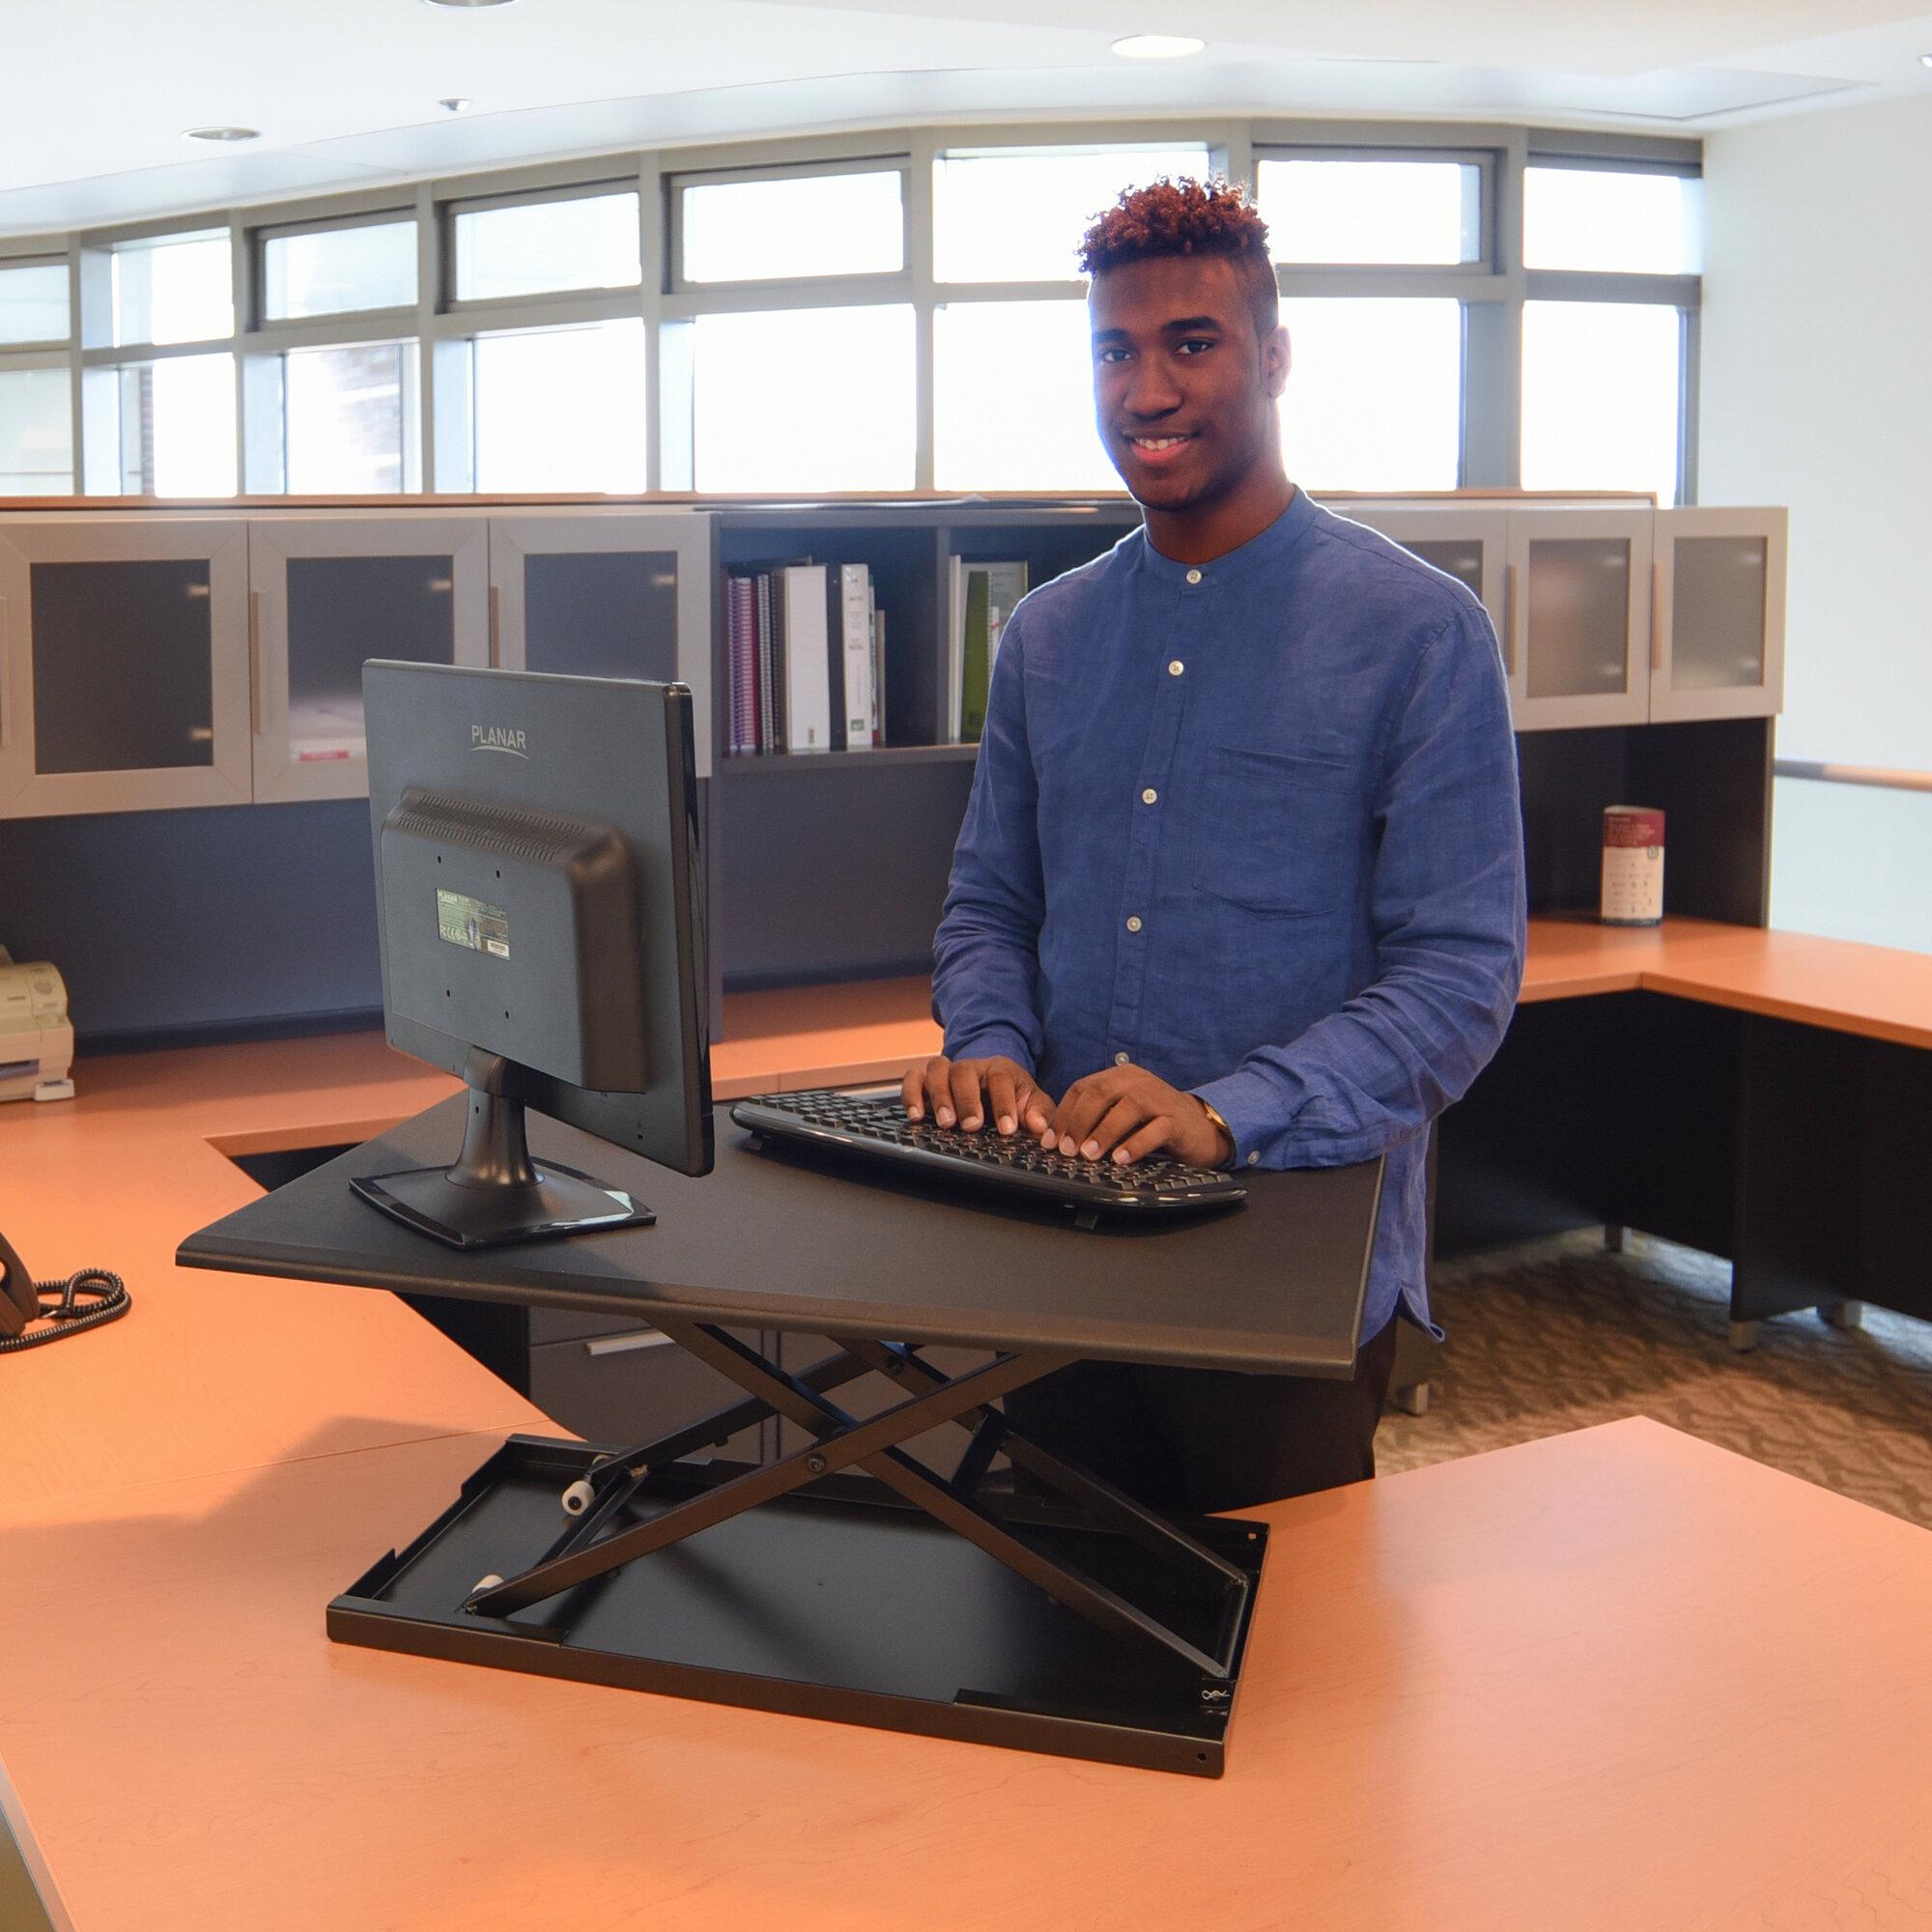 Luxor Pneumatic Adjustable Desktop Standing Desk Ebay